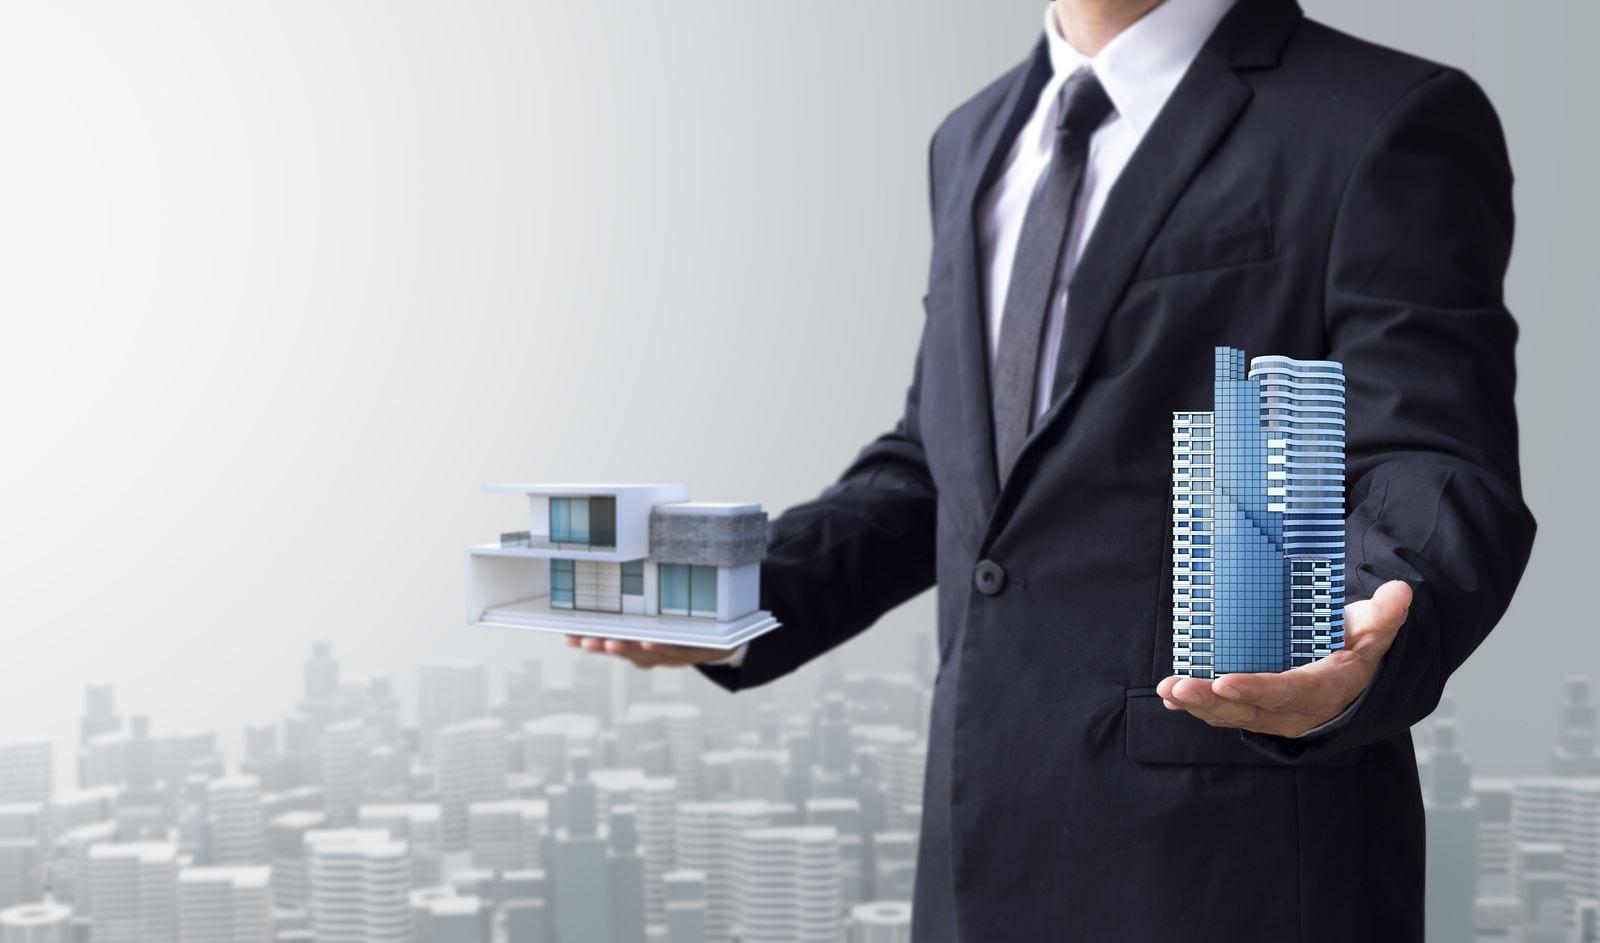 Commercial real estate vs residential real estate